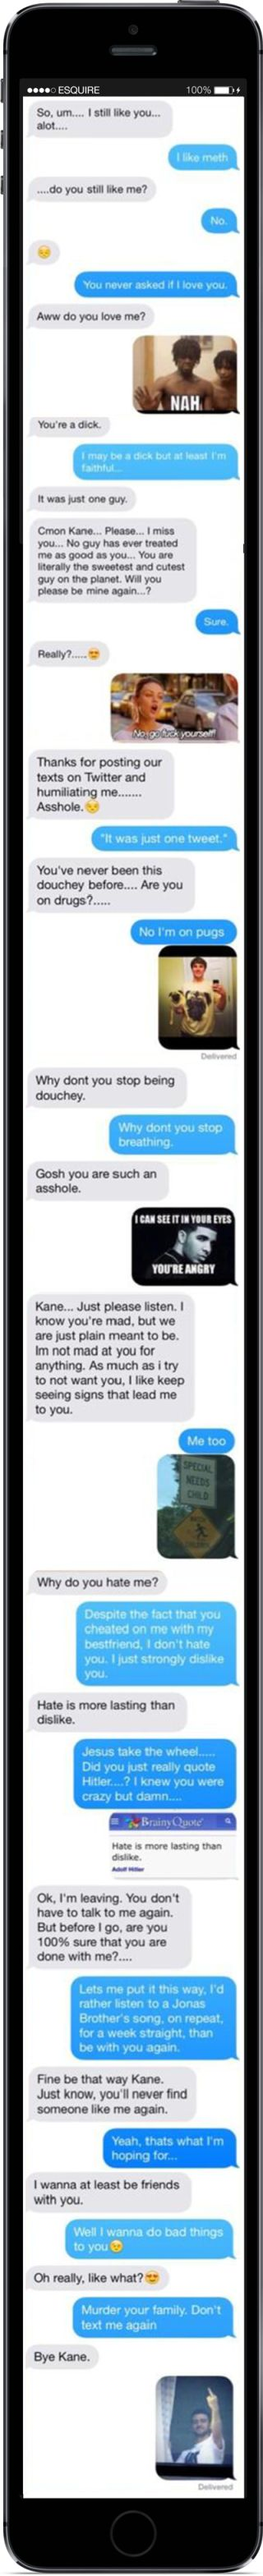 iPhone Meme Breakup  - Seventeen.com